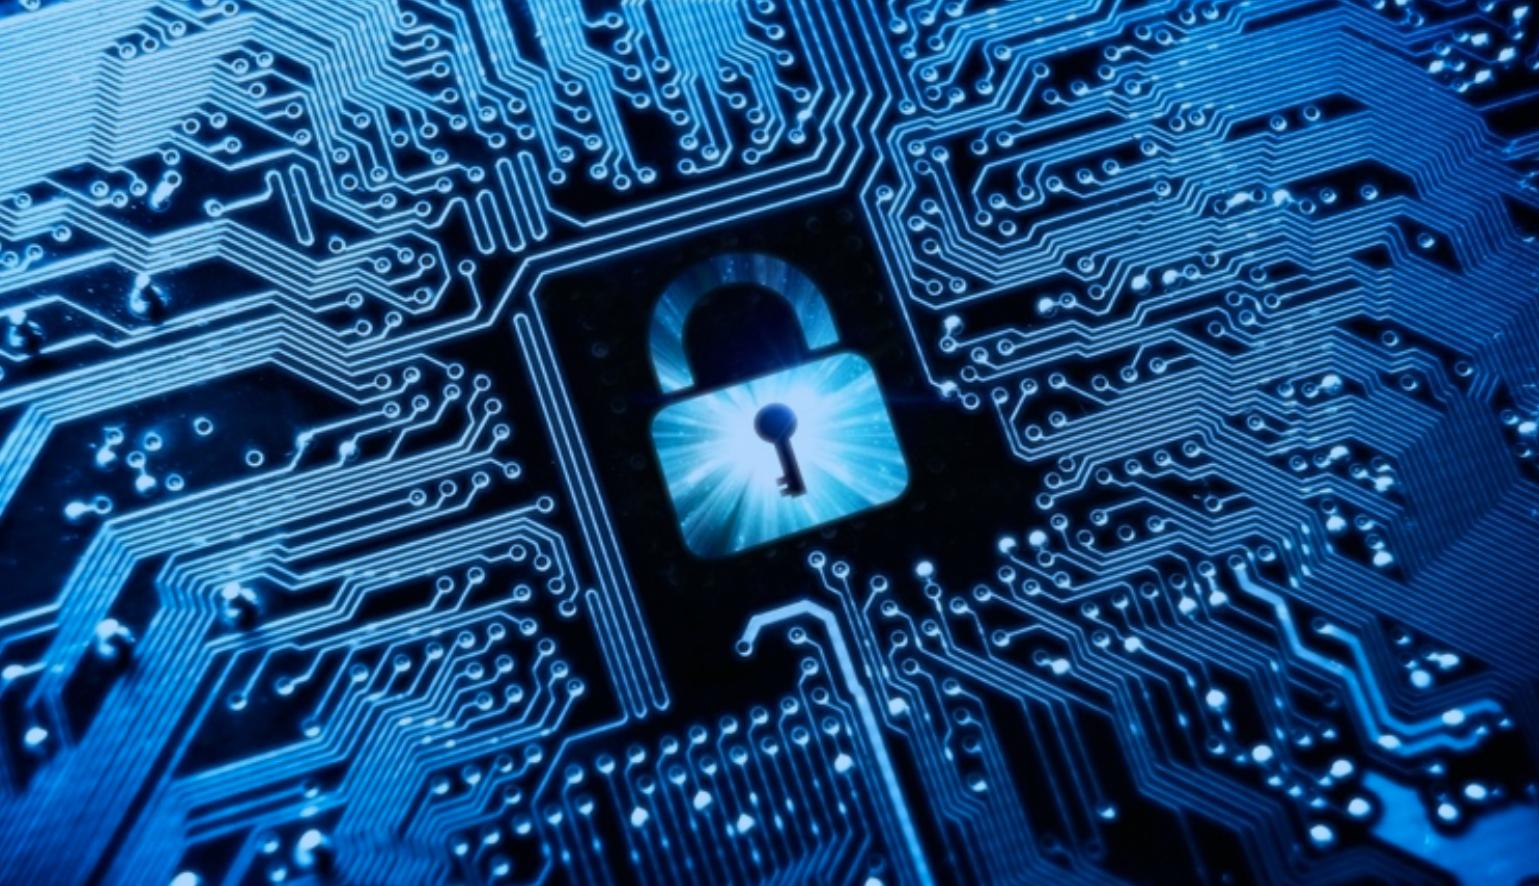 Secure Silicon Fingerprint white paper